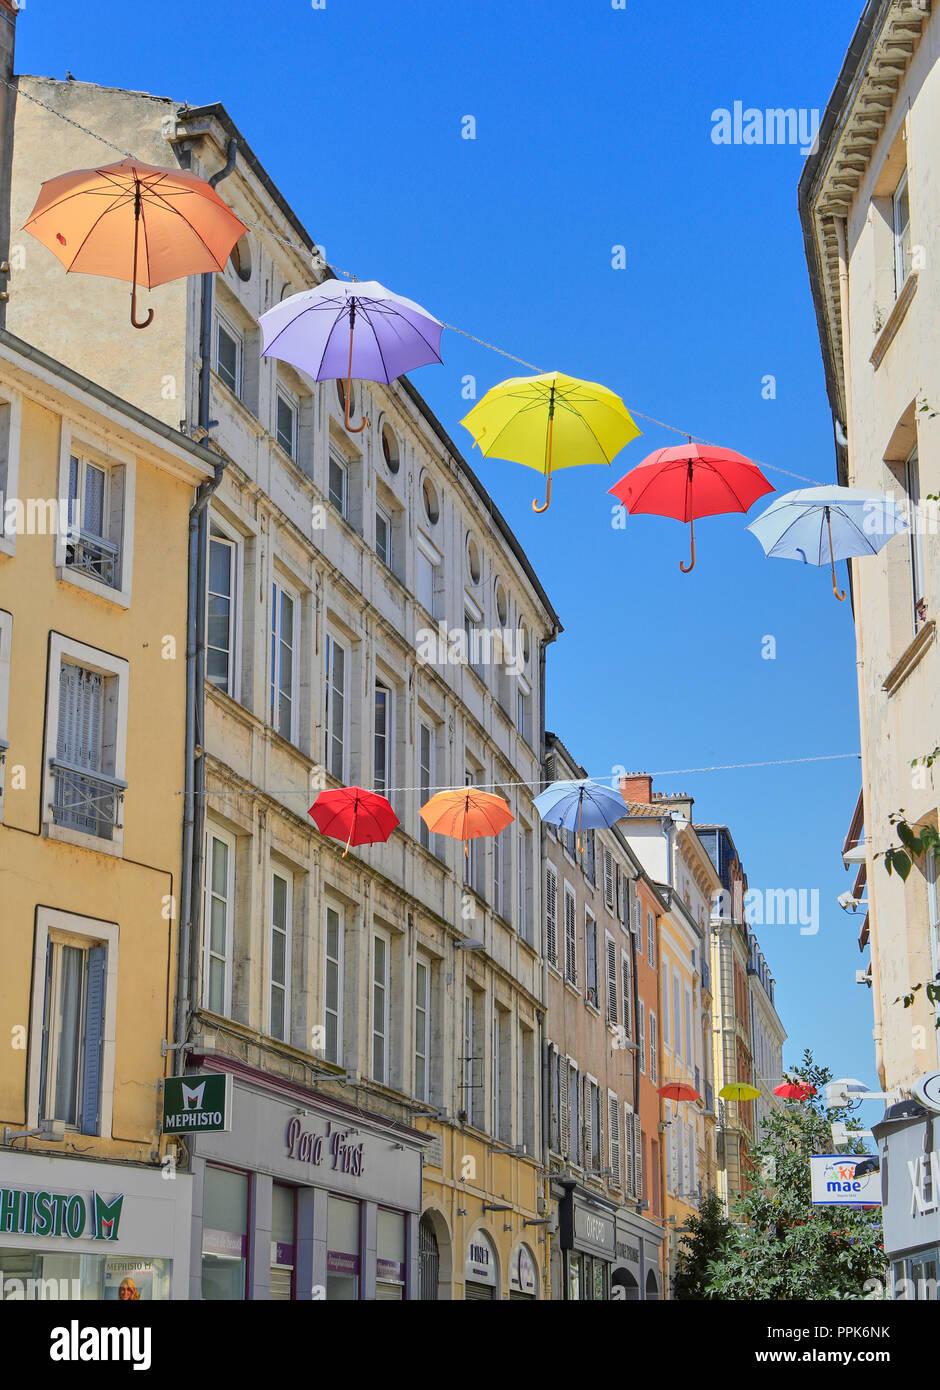 Macon. Colorful umbrellas hanging on the streets. Saône-et-Loire, Bourgogne-Franche-Comté. France. Eurppe Stock Photo